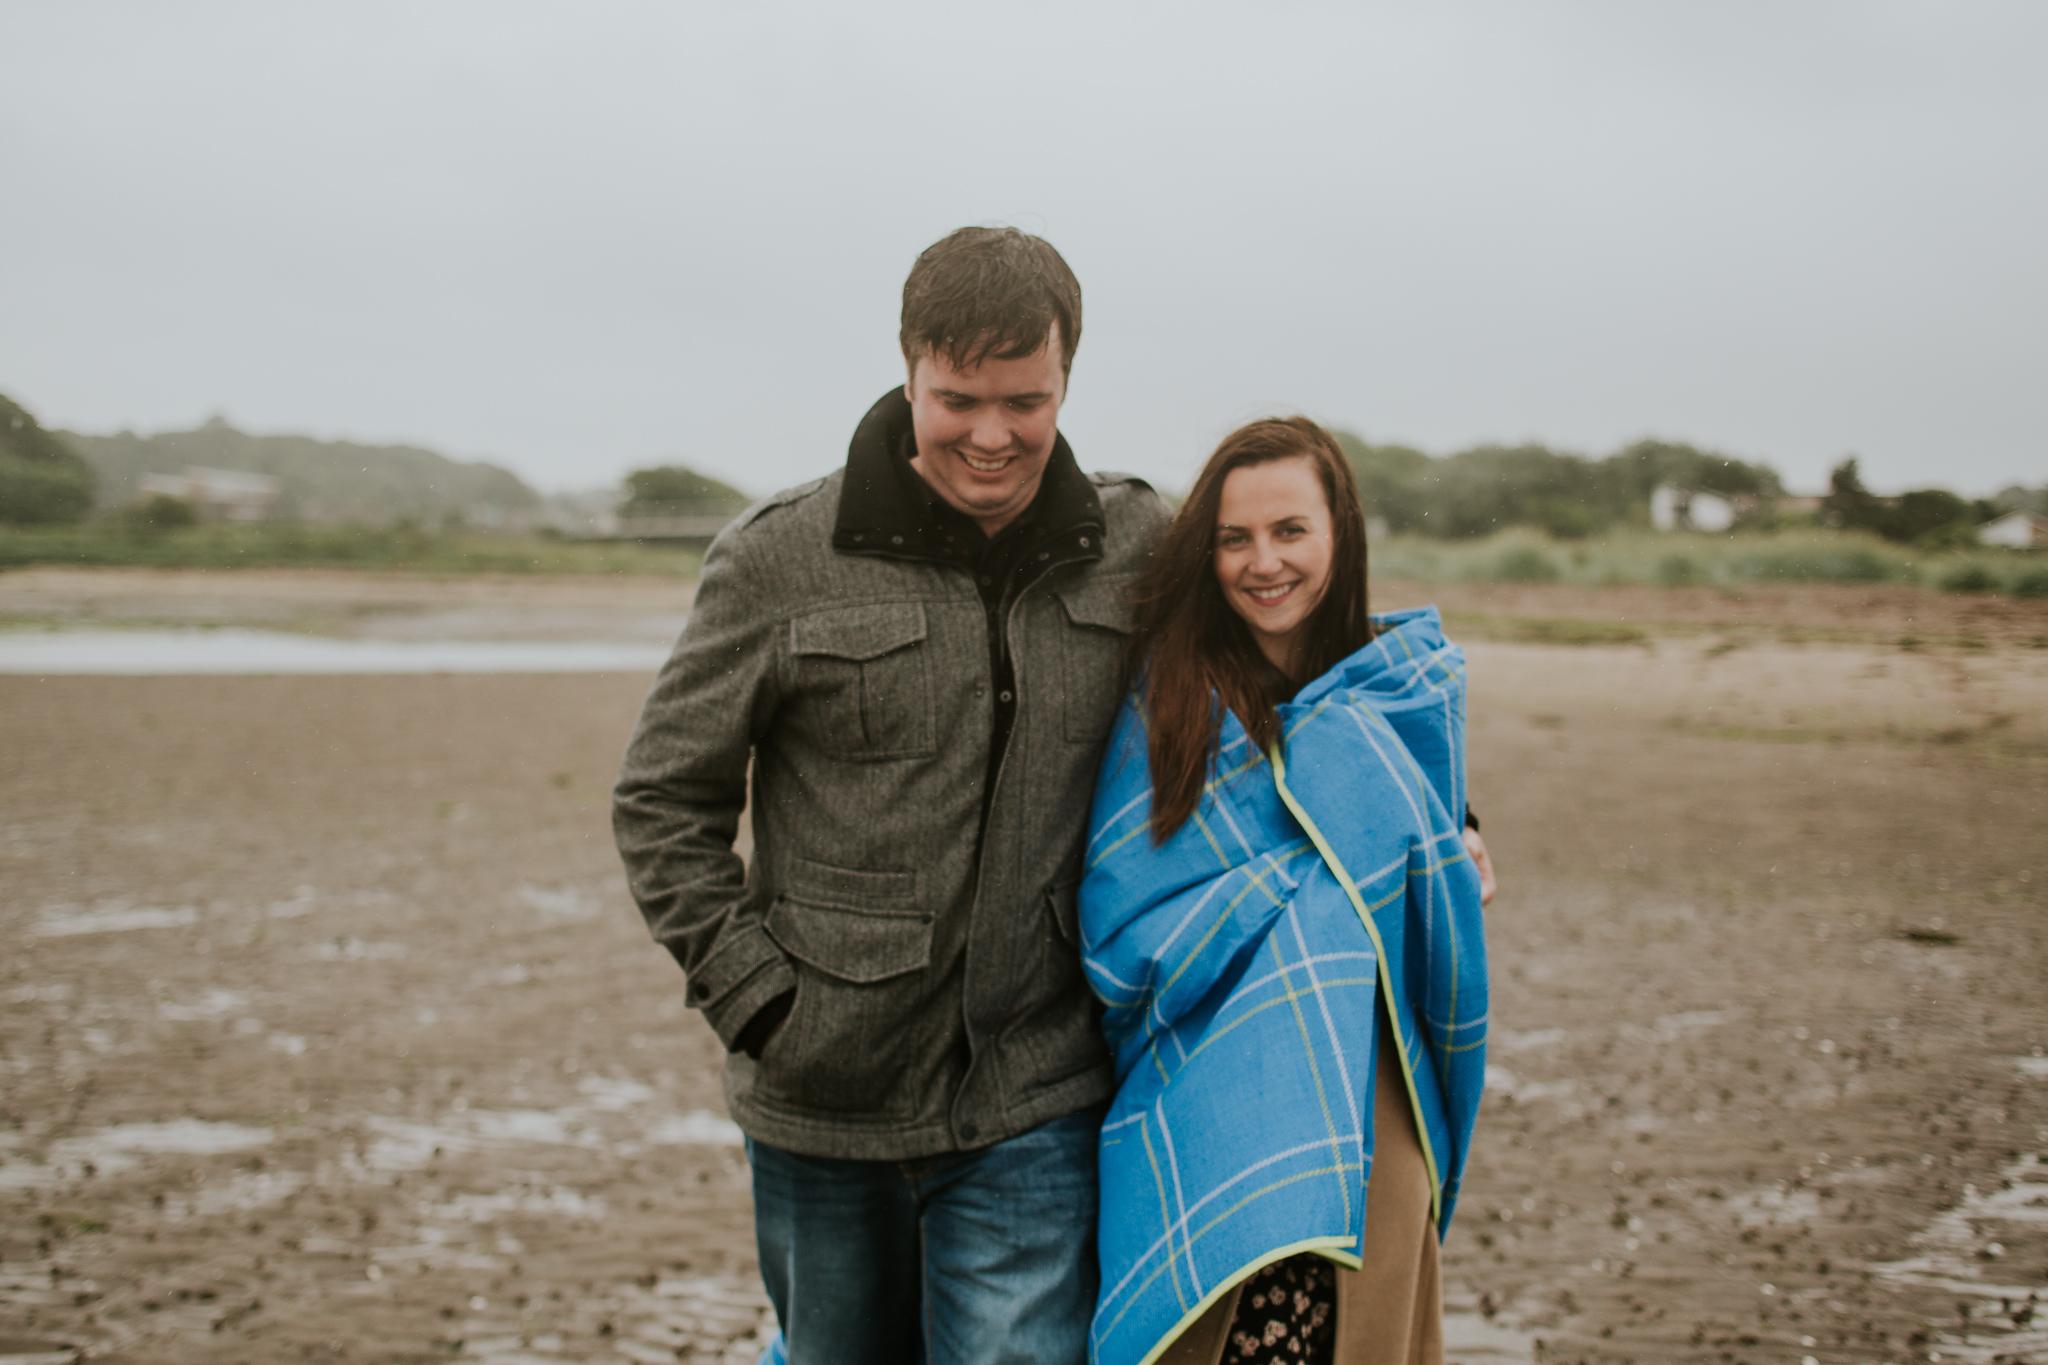 natural wedding photos glasgow, glasgow wedding photographer, alternative wedding photographer, the best ayrshire wedding photographer